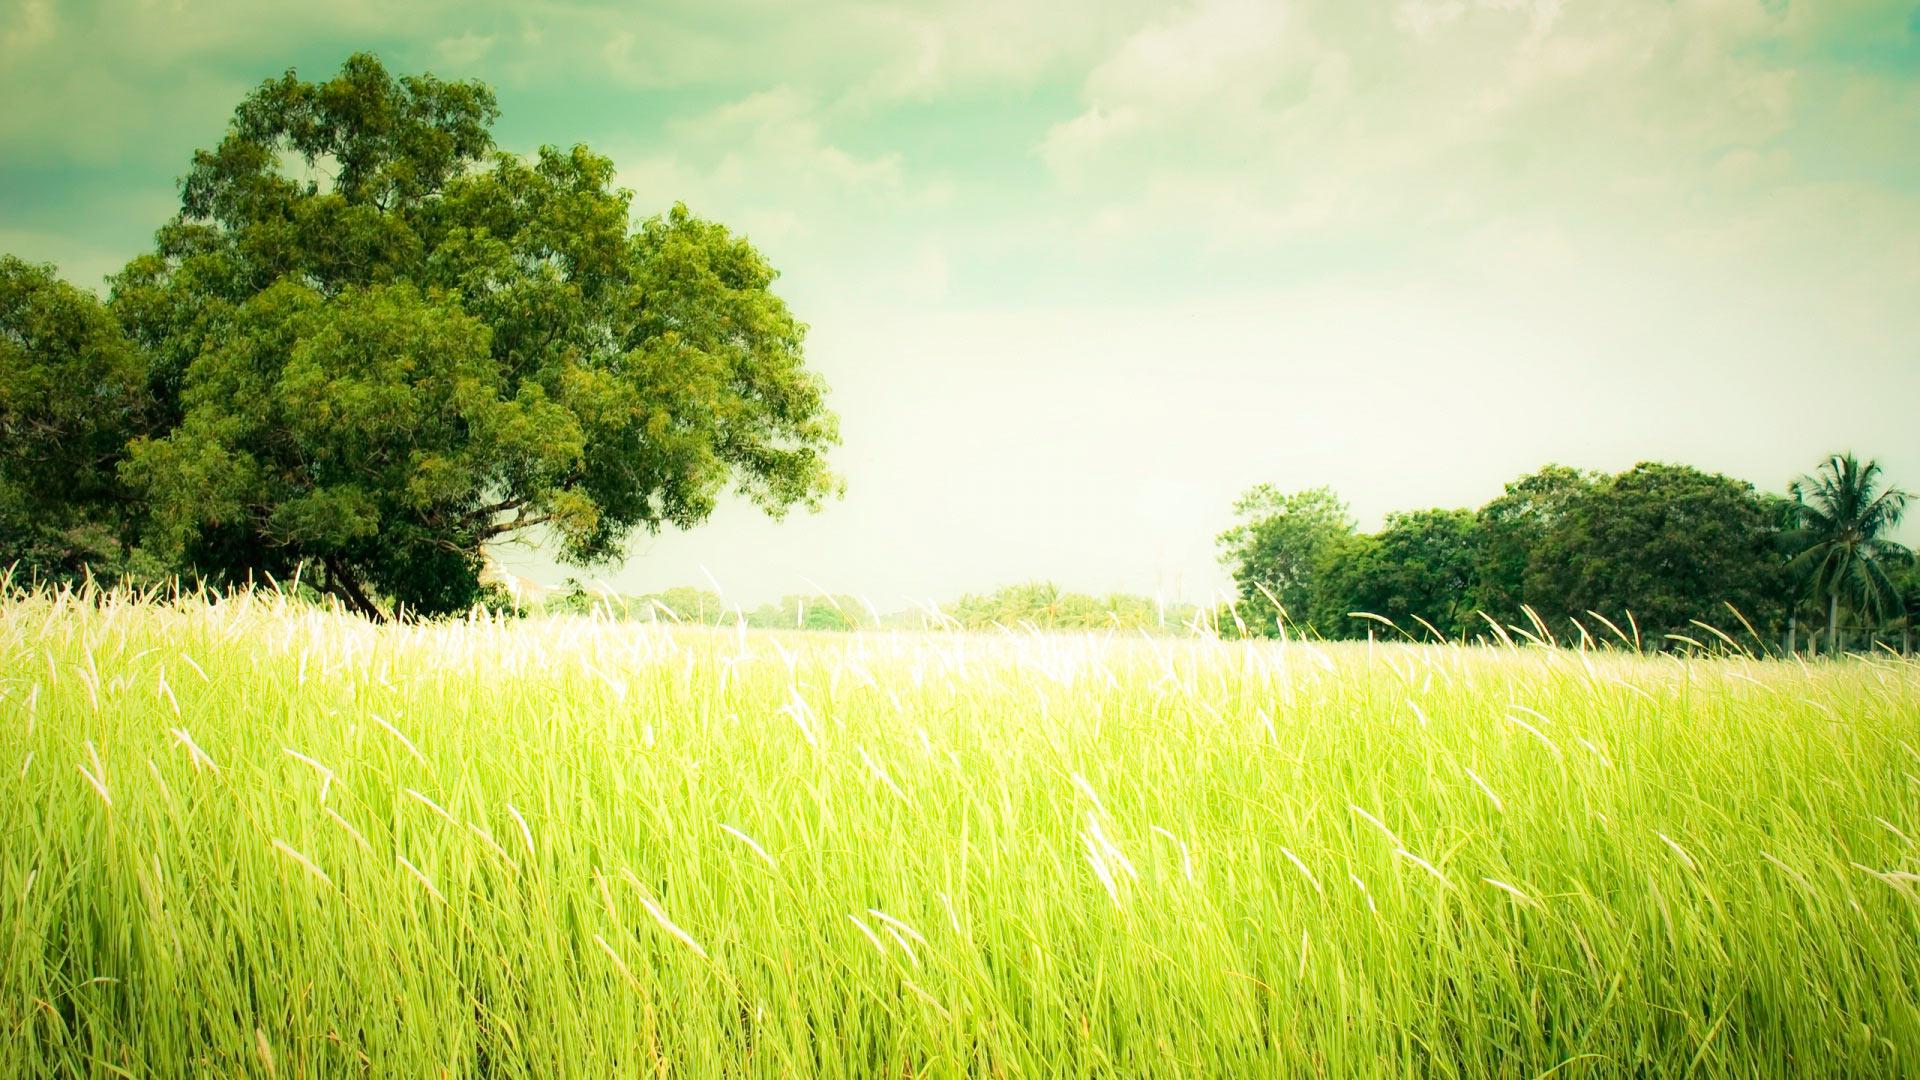 ... Летнее поле травы, Поле с деревьями: www.fullhdoboi.ru/photo/nature/letnee_pole_travy/6-0-15870